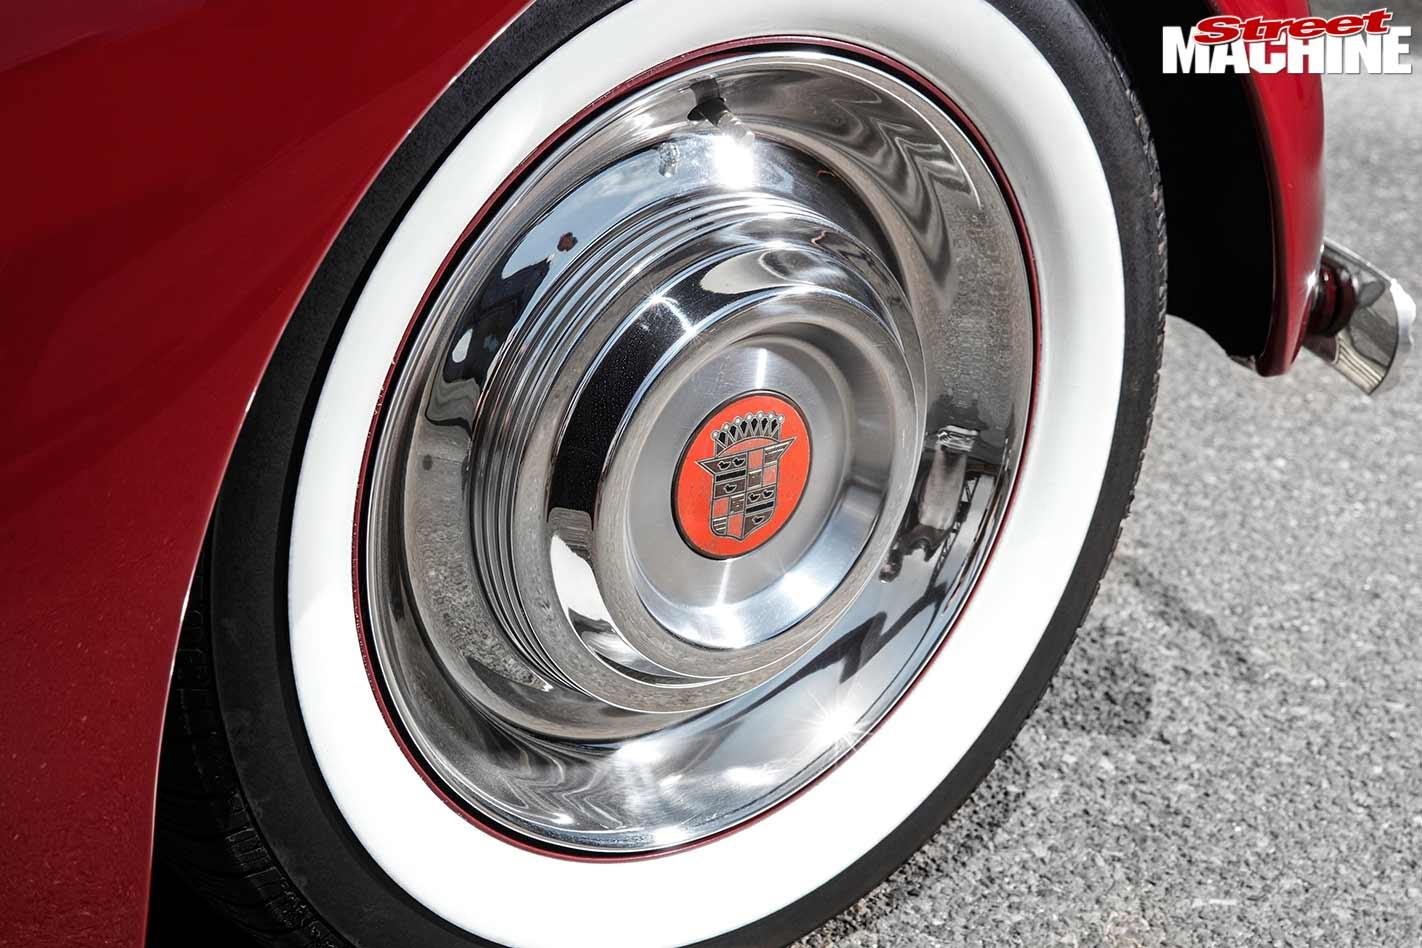 Ford Cabriolet wheel